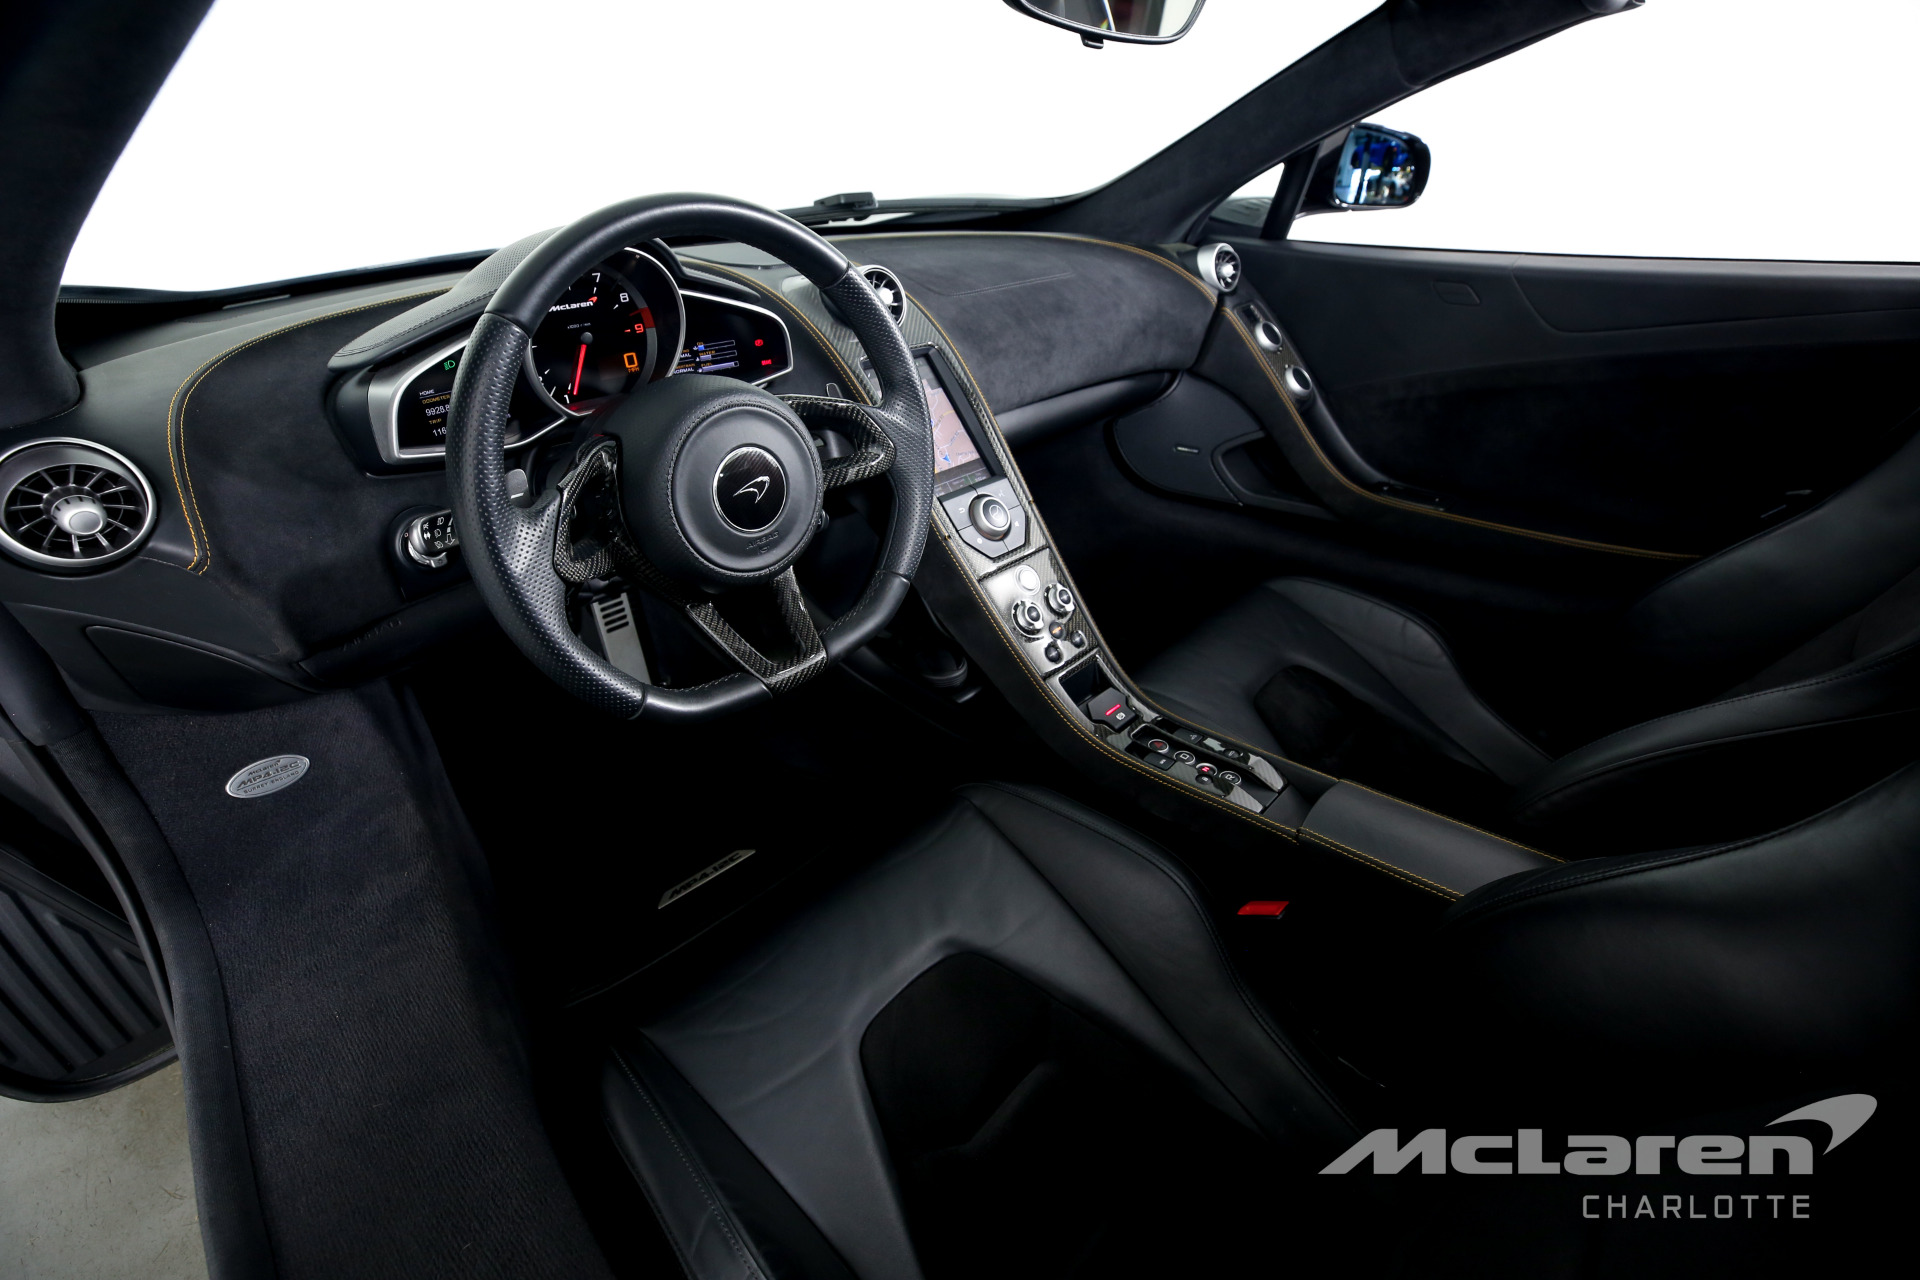 Used 2014 McLaren MP4-12C Spider    Charlotte, NC